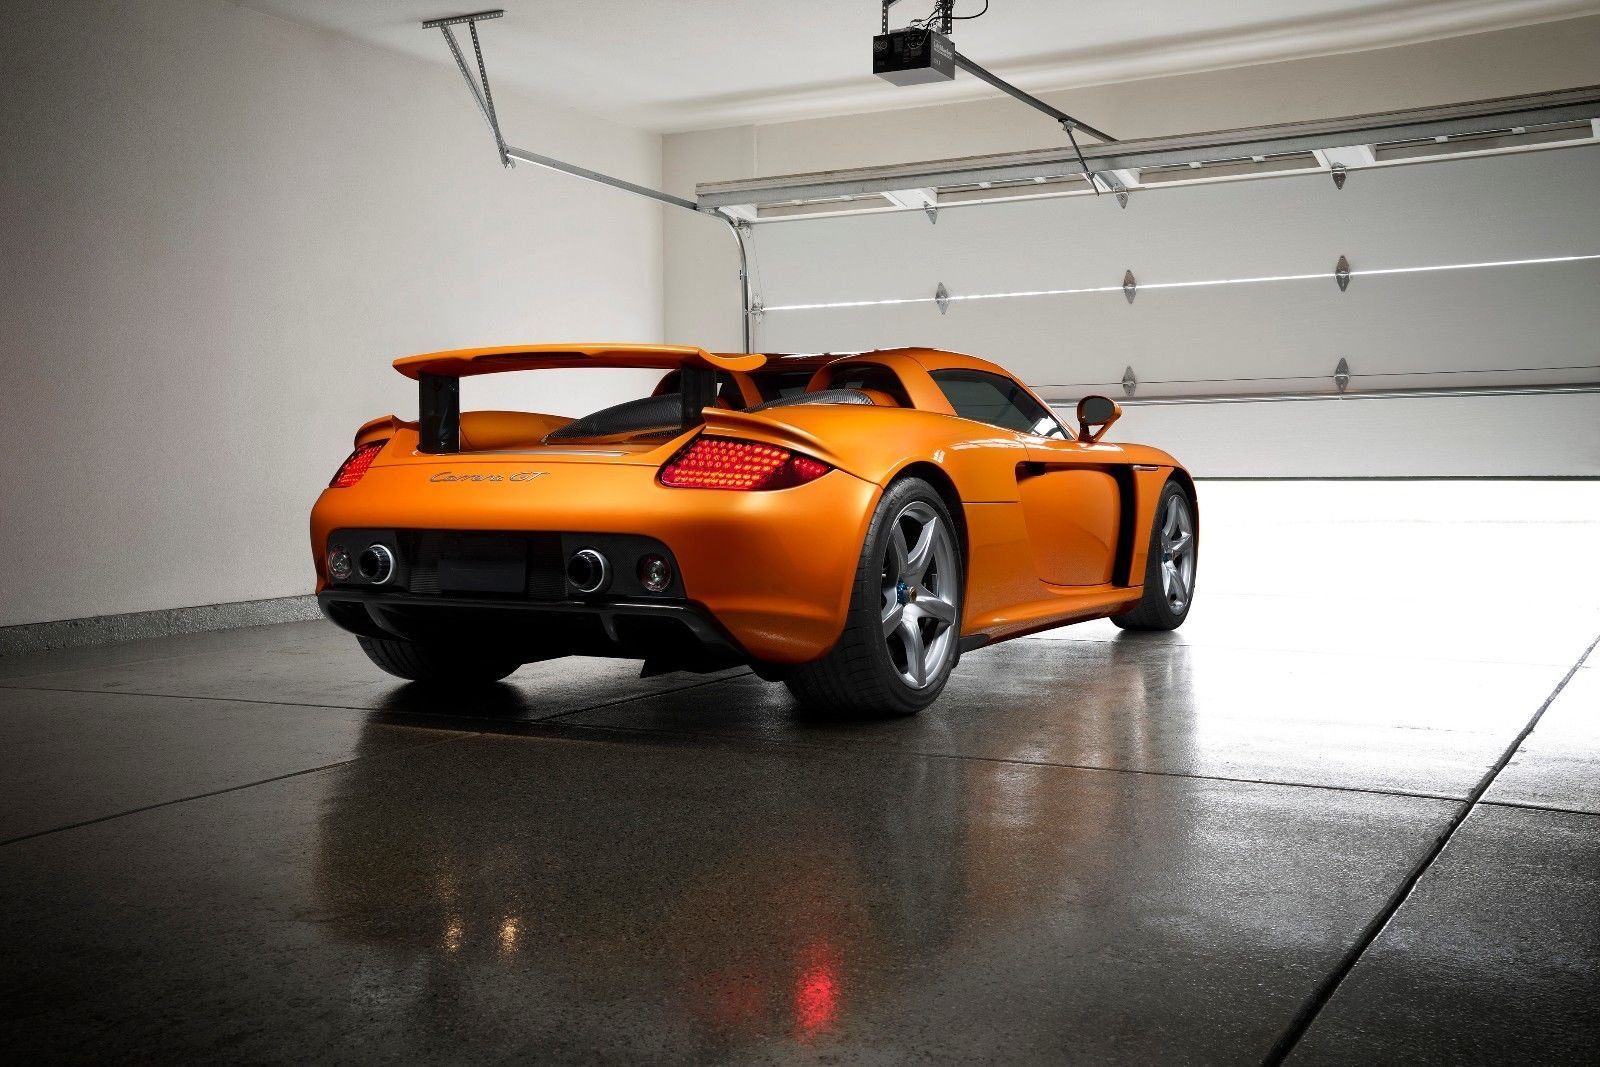 Porsche_Carrera_GT_Αrancio_Βorealis_0000